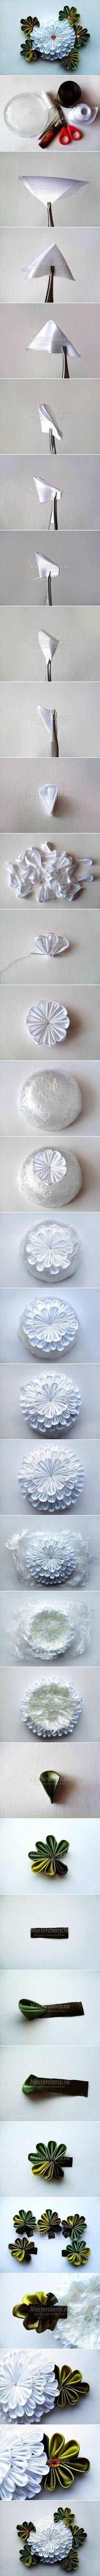 DIY White Chrysanthemum Flower DIY Projects | UsefulDIY.com